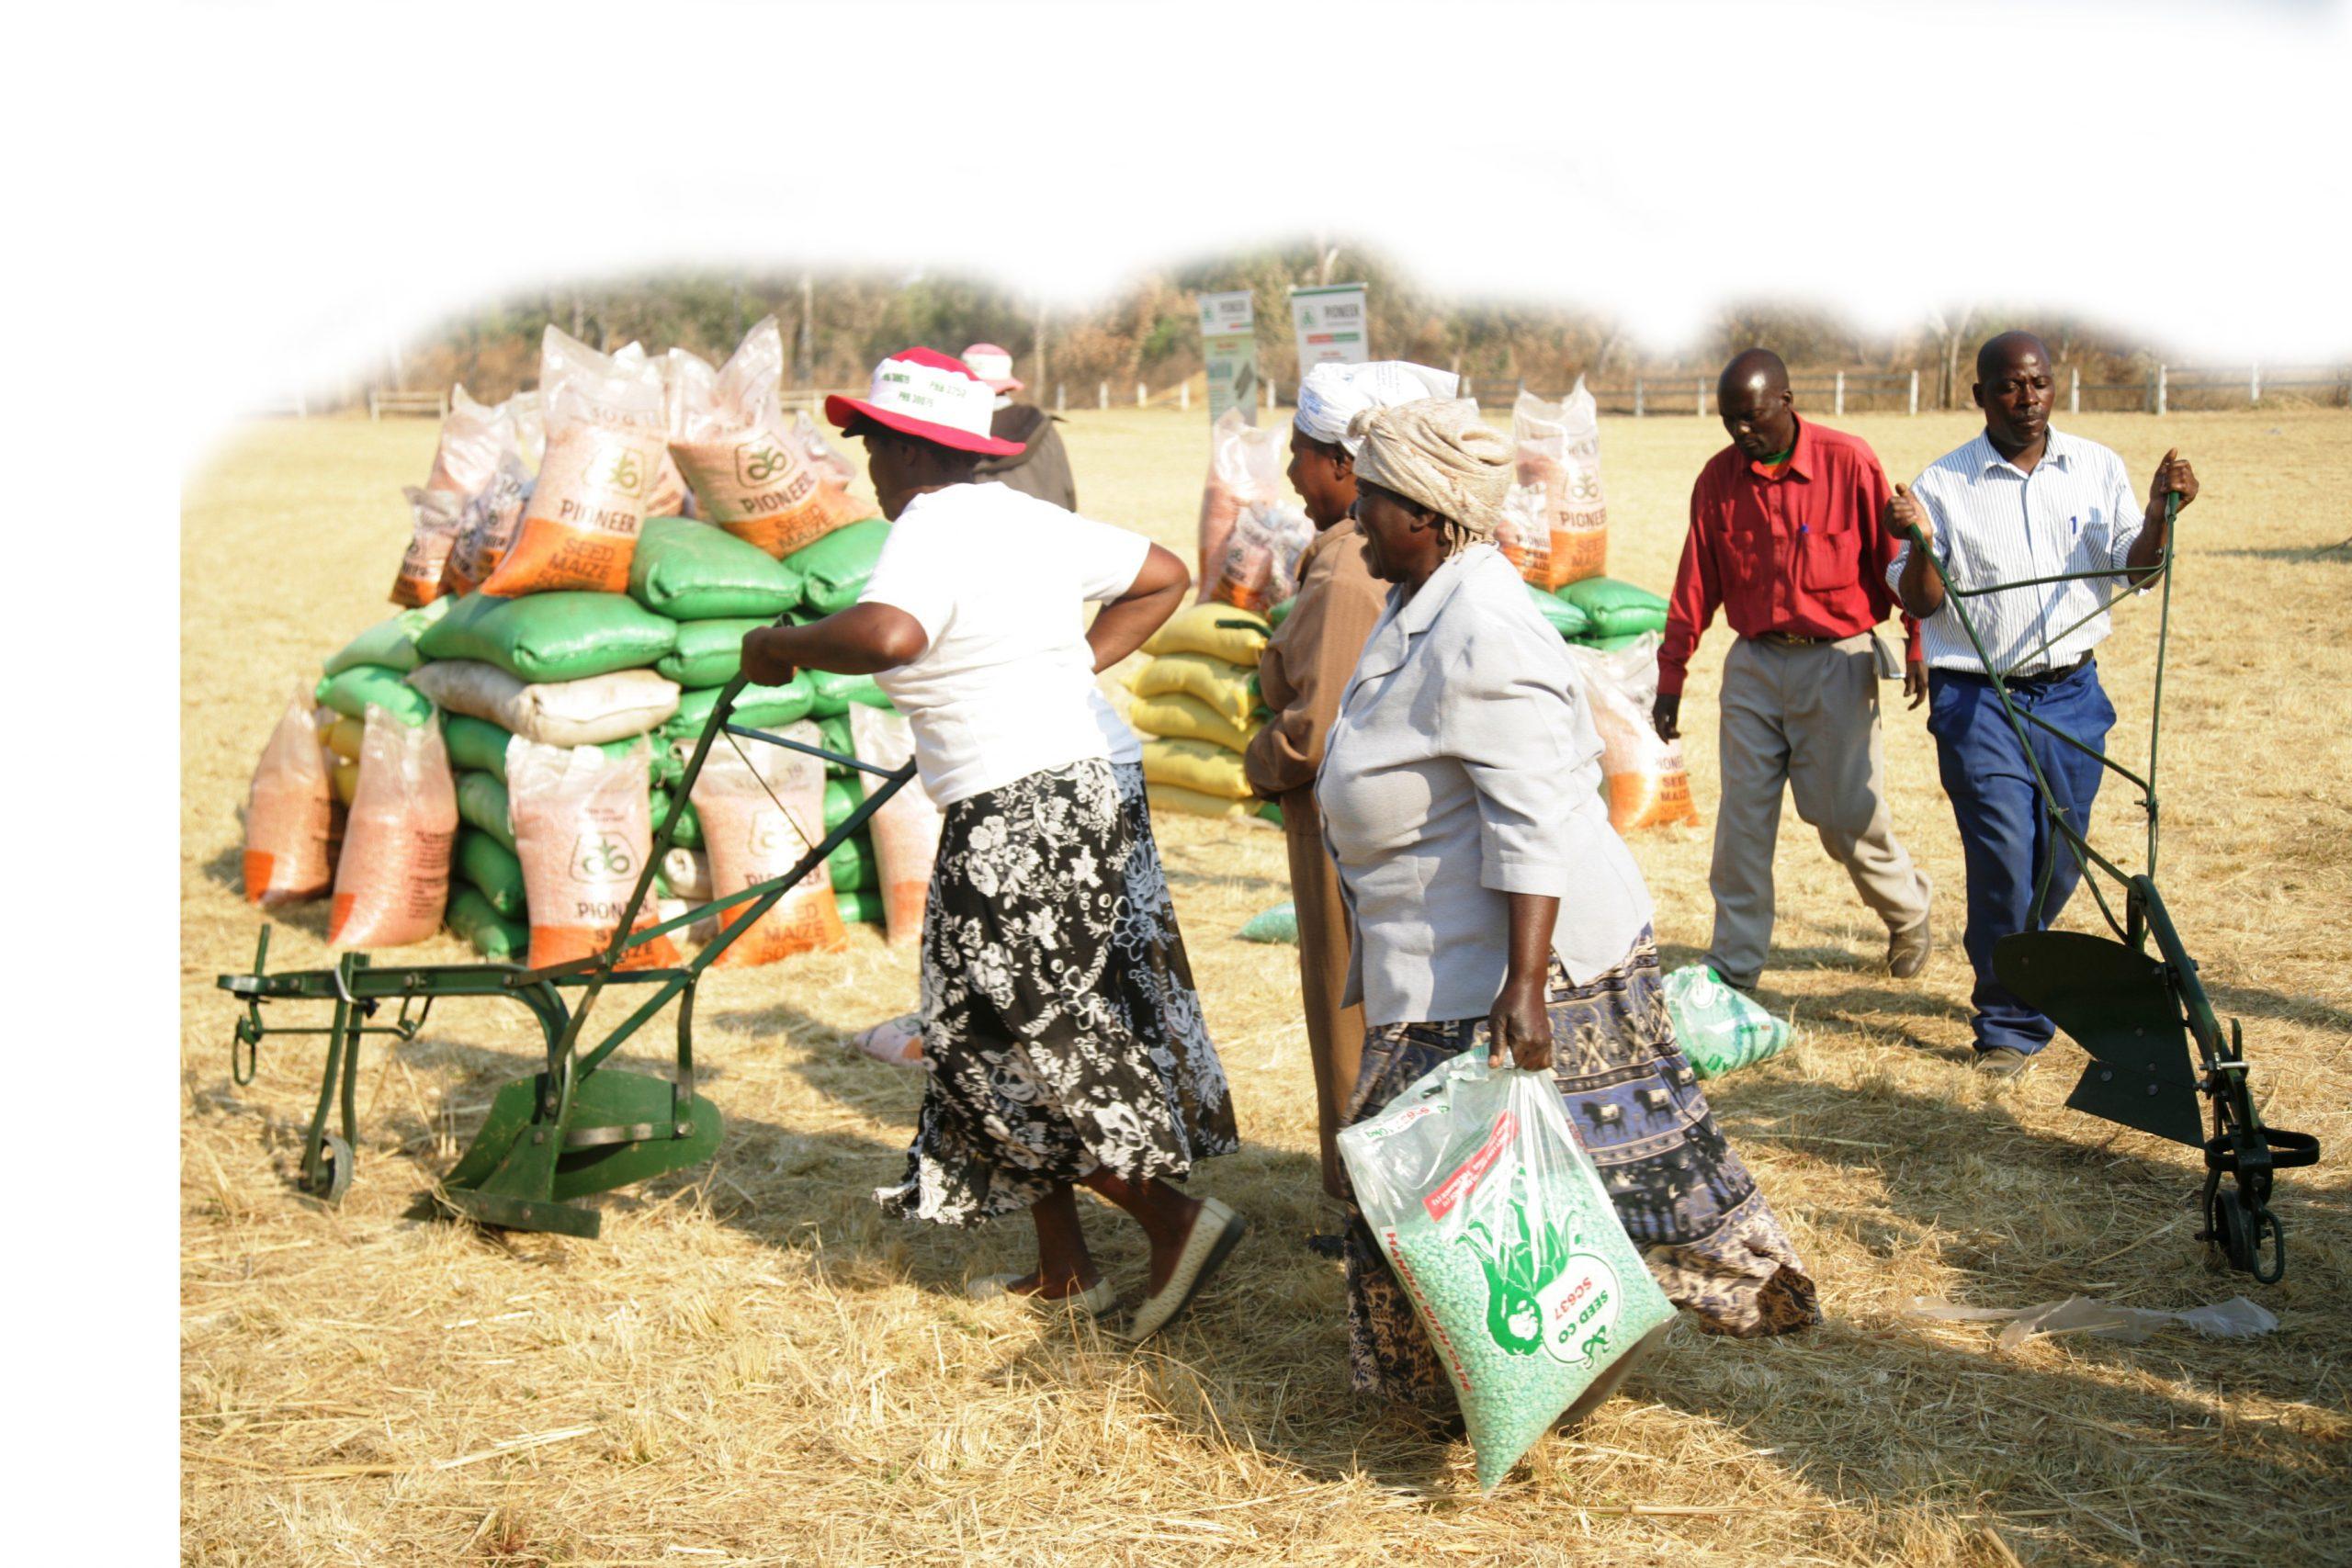 Government's Pfumvudza inputs find way onto black market